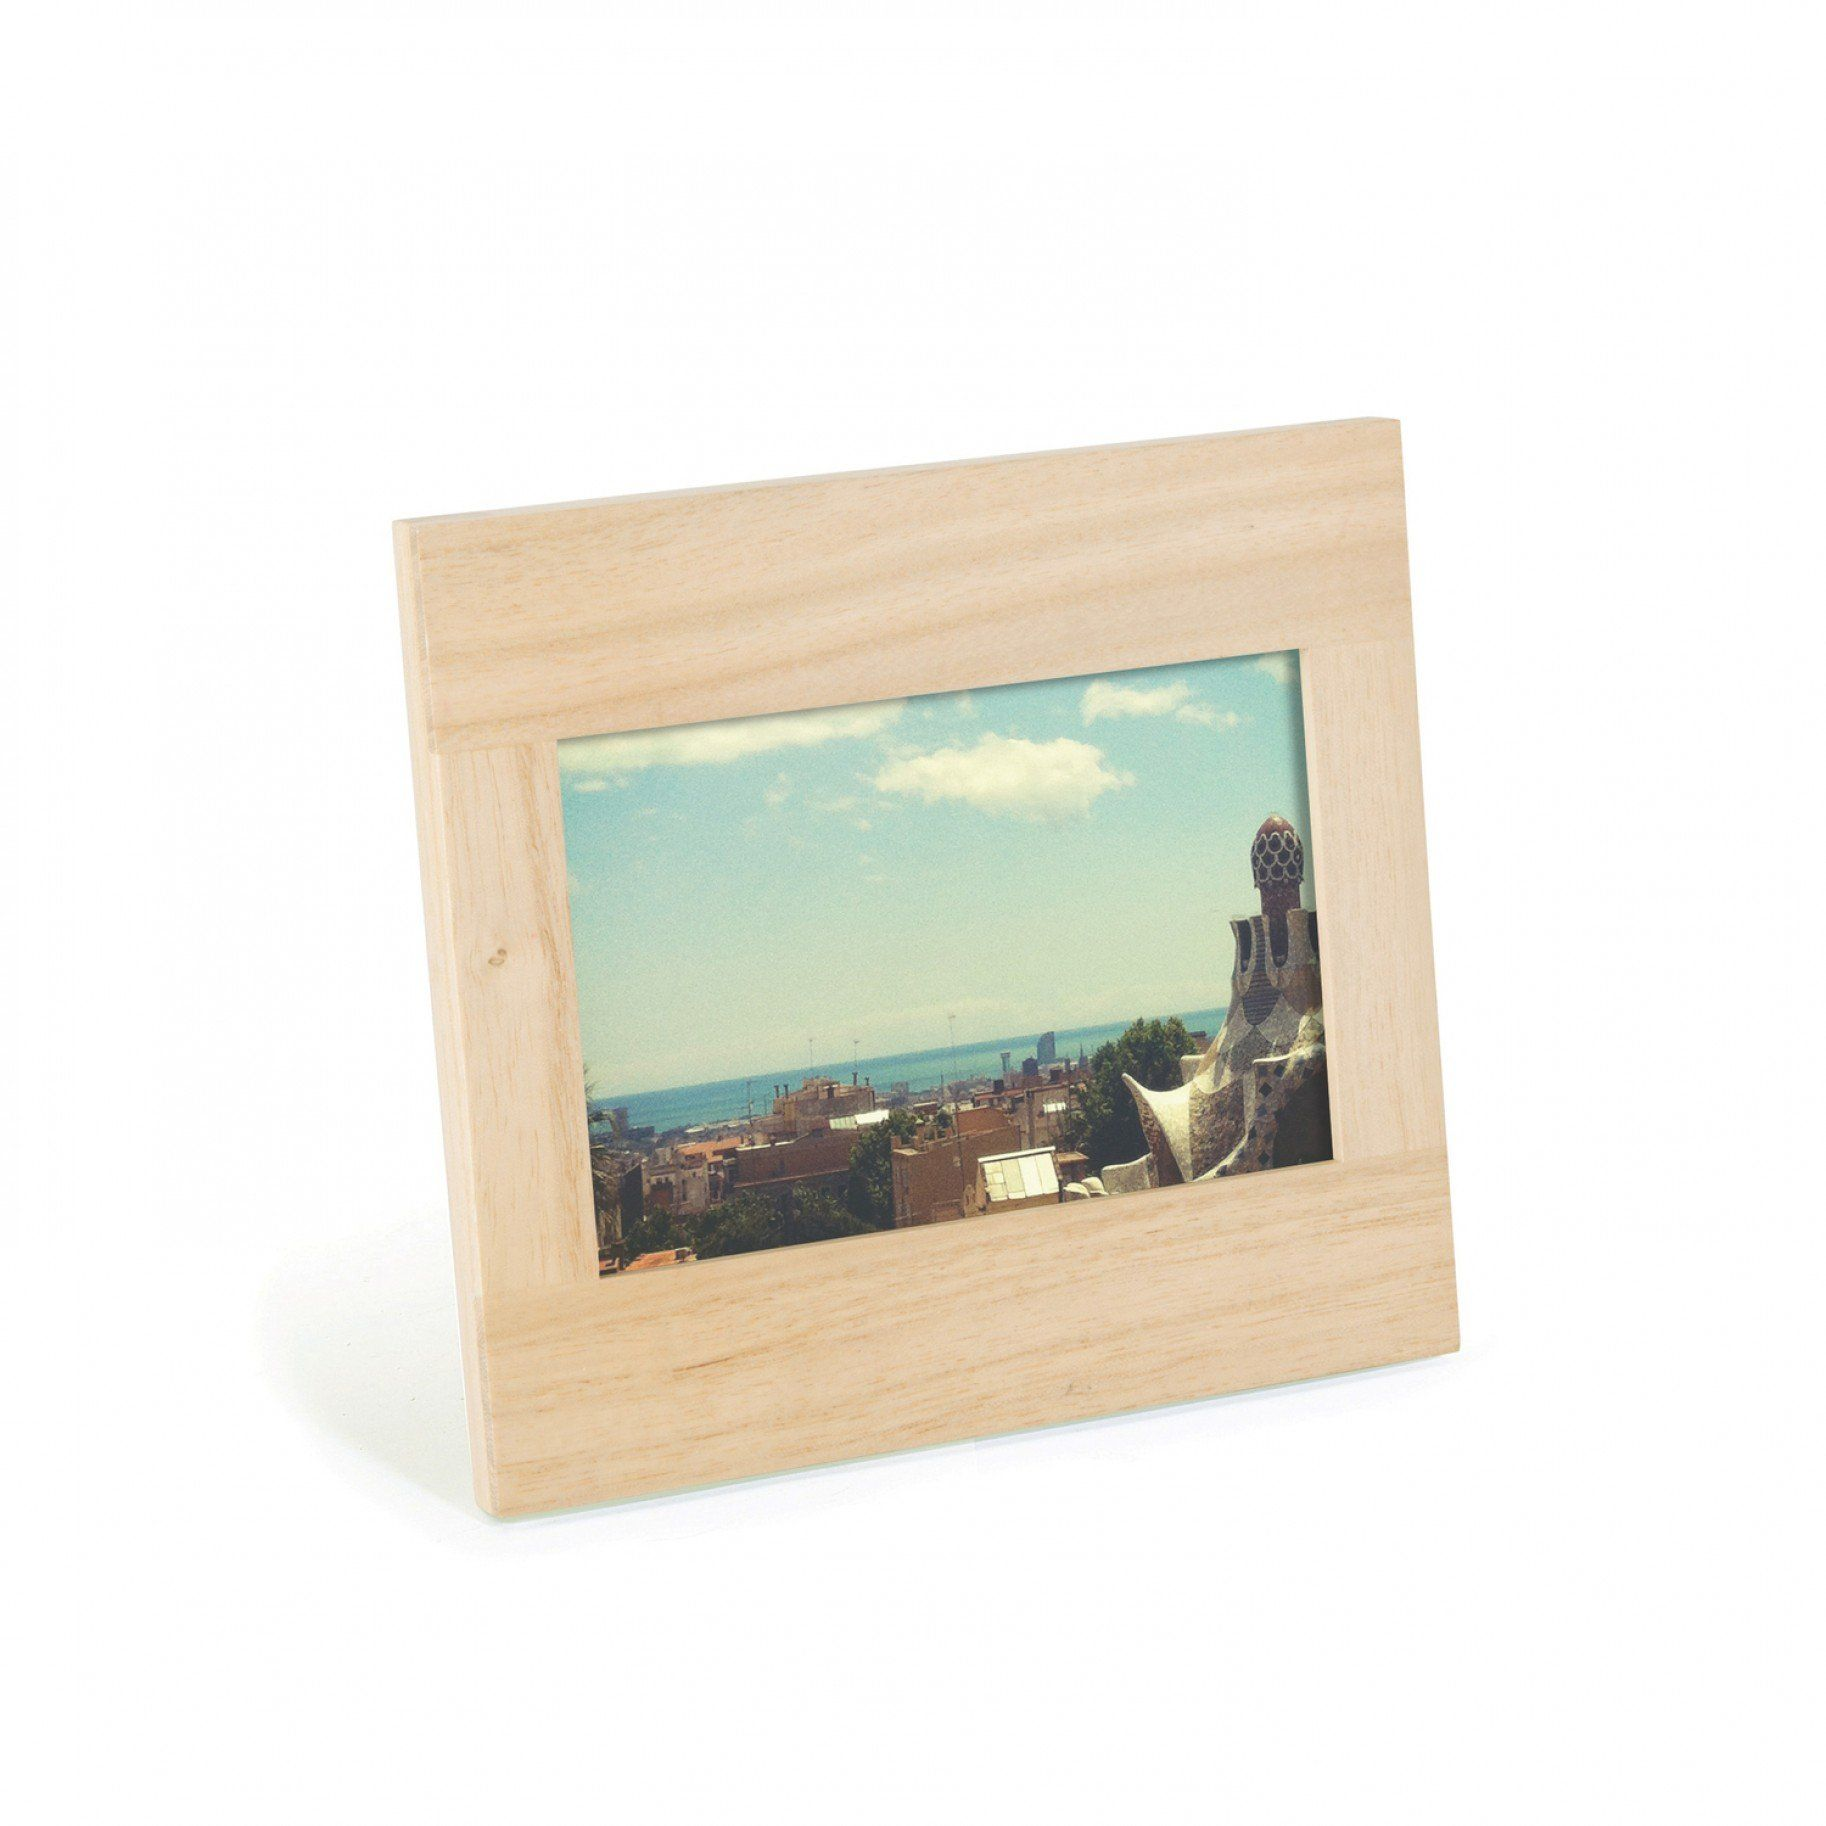 simple frame 4x6   流行风   Pinterest   Woods